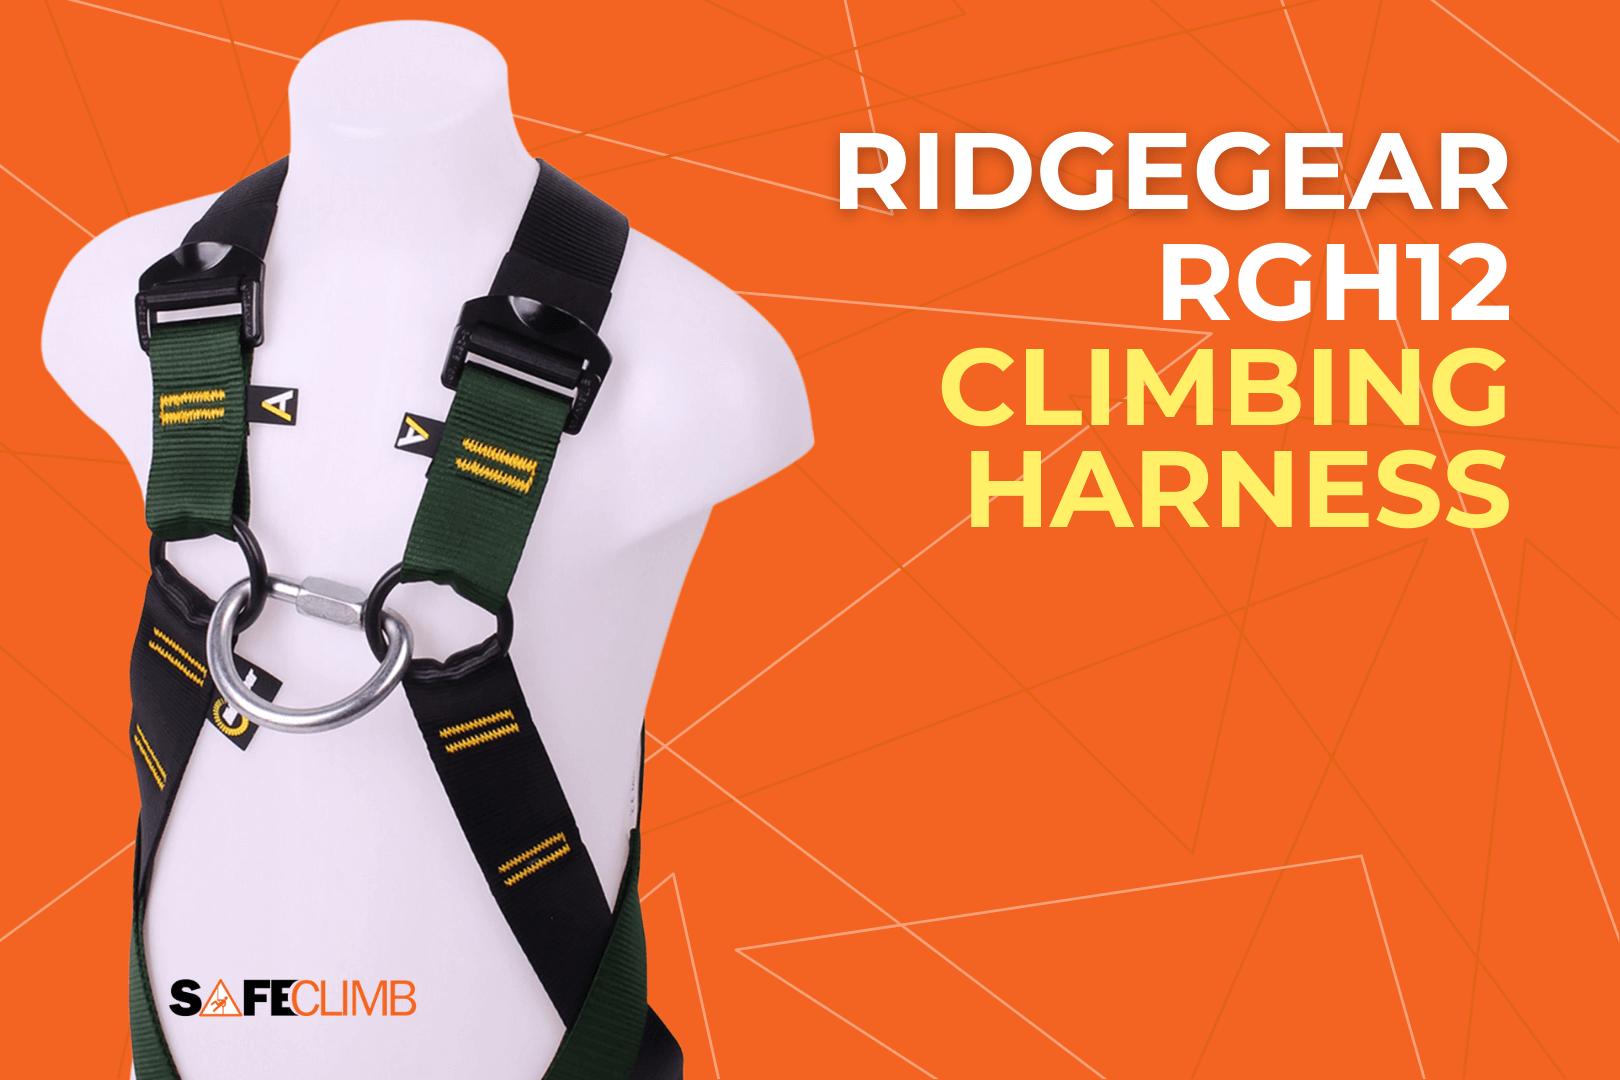 RidgeGear RGH12 Climbing Harness